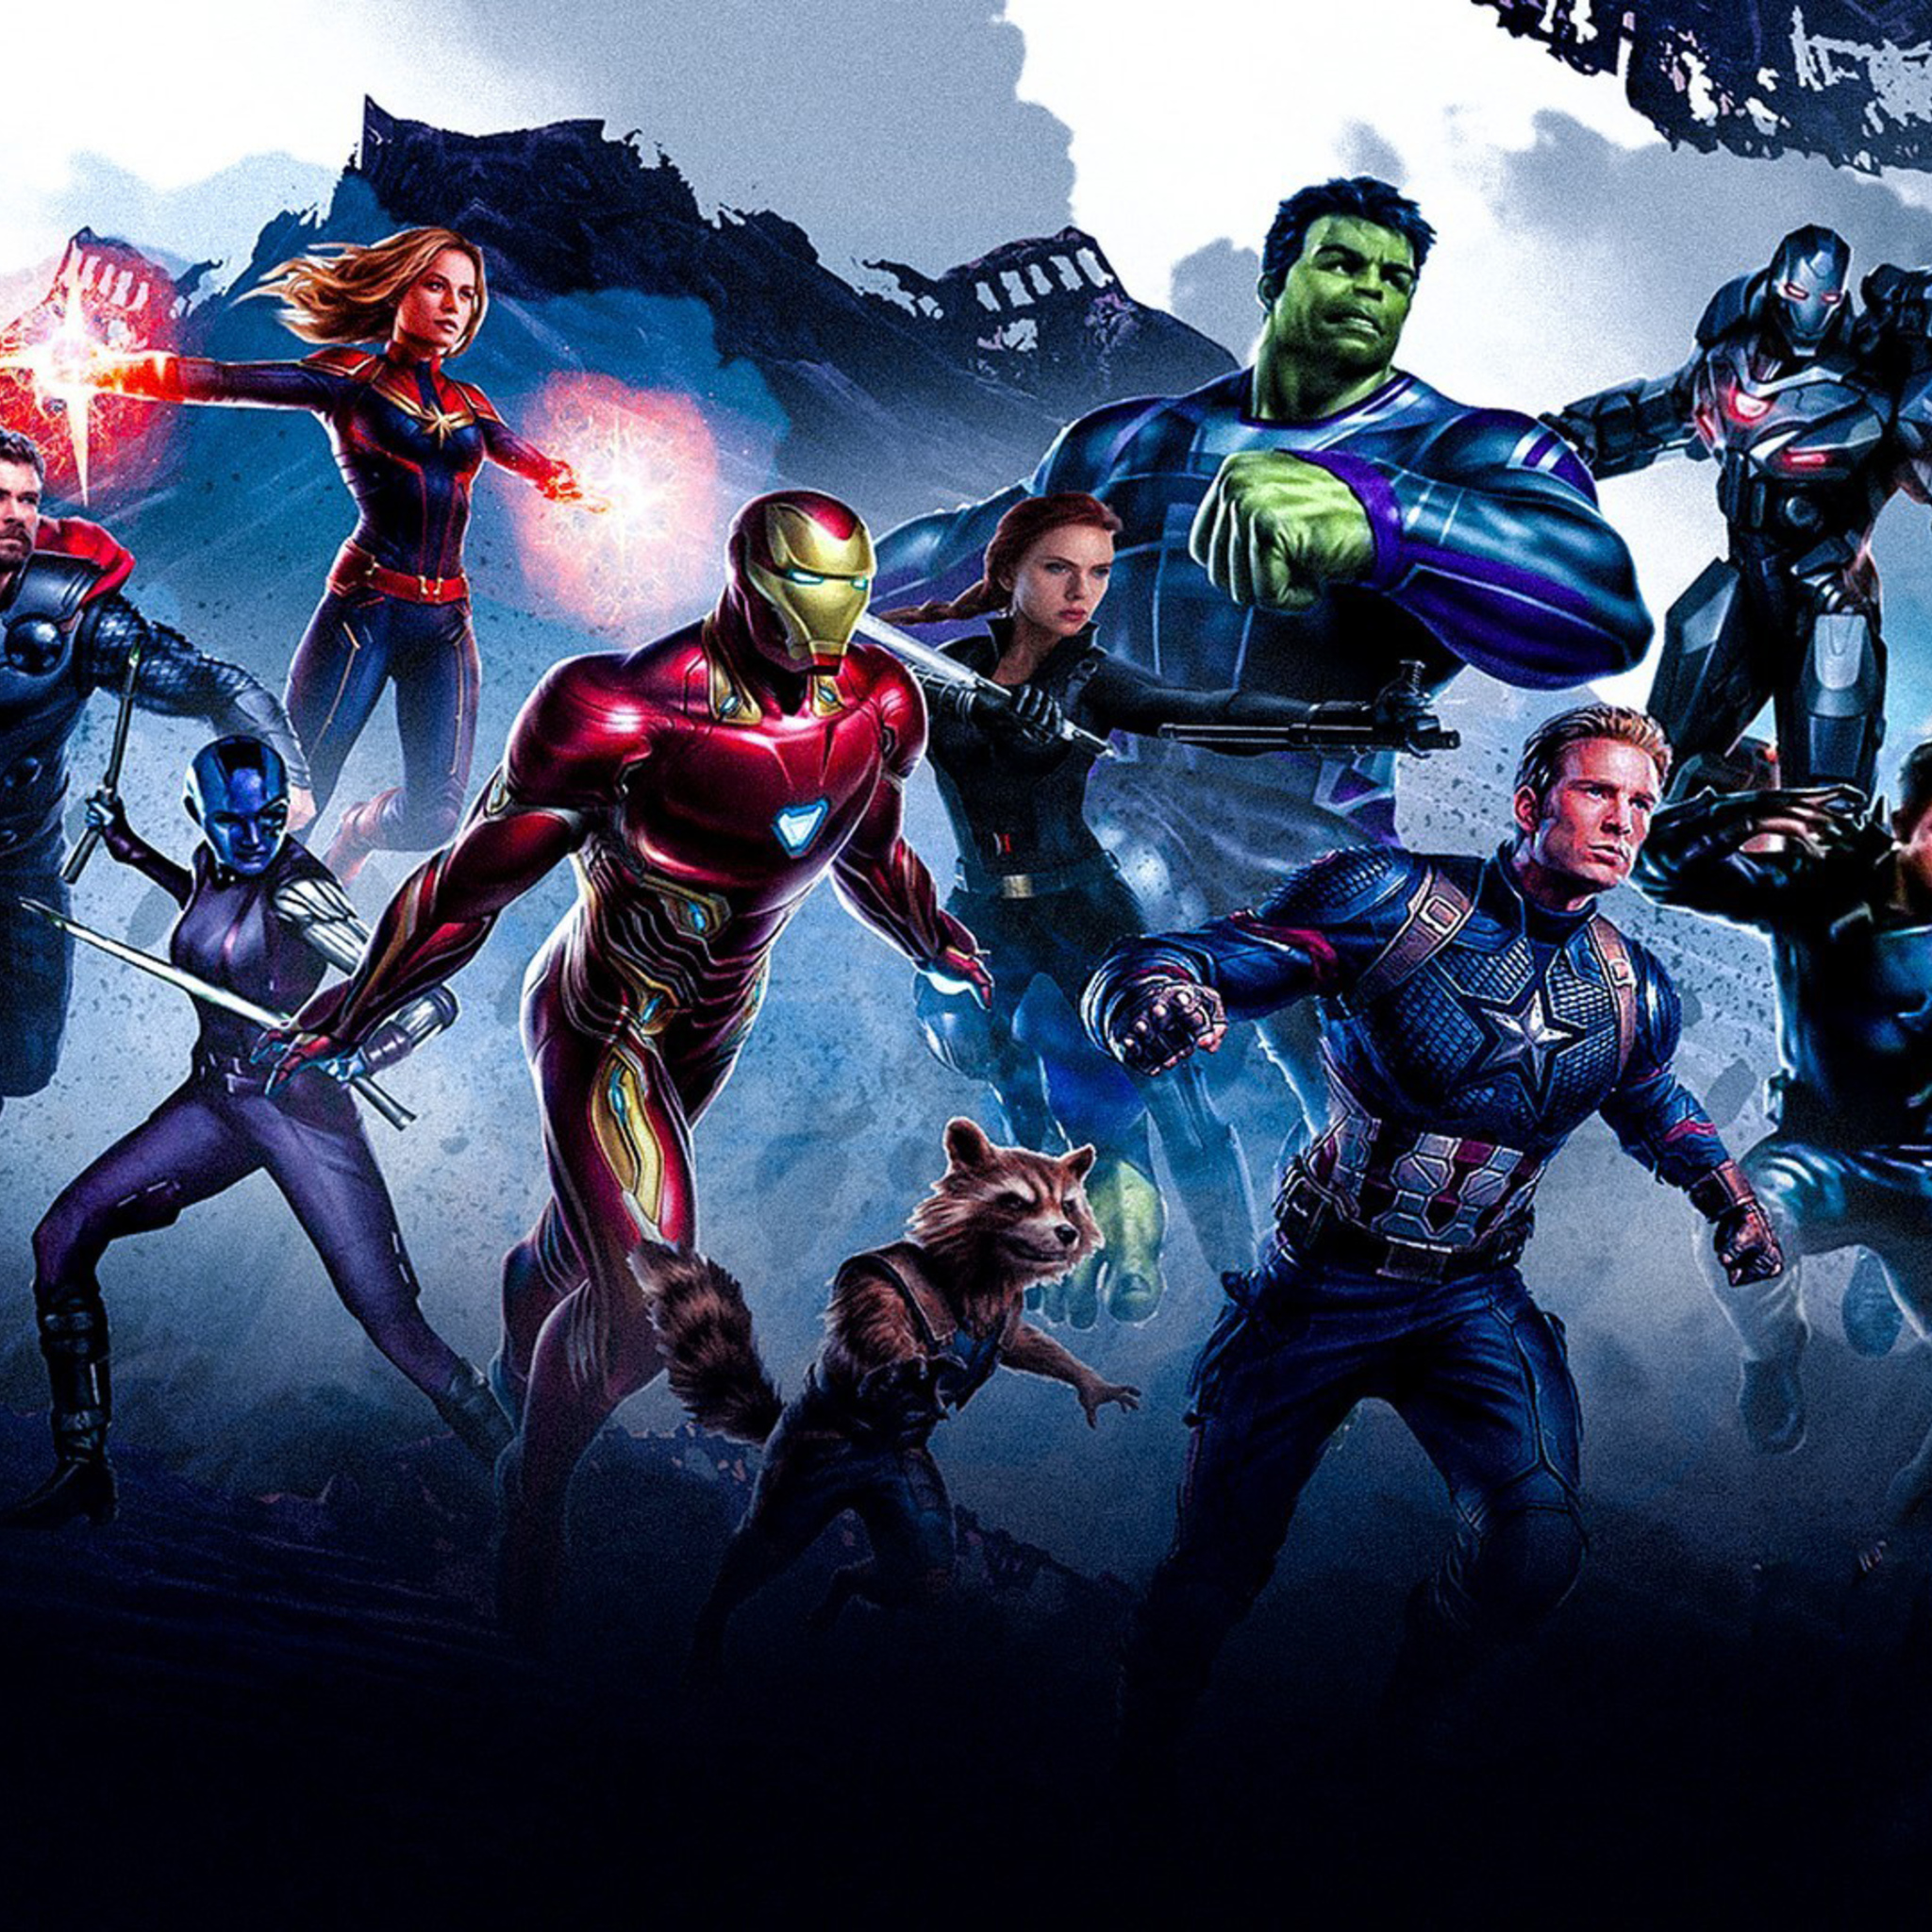 2048x2048 Avengers Endgame Poster Ipad Air HD 4k